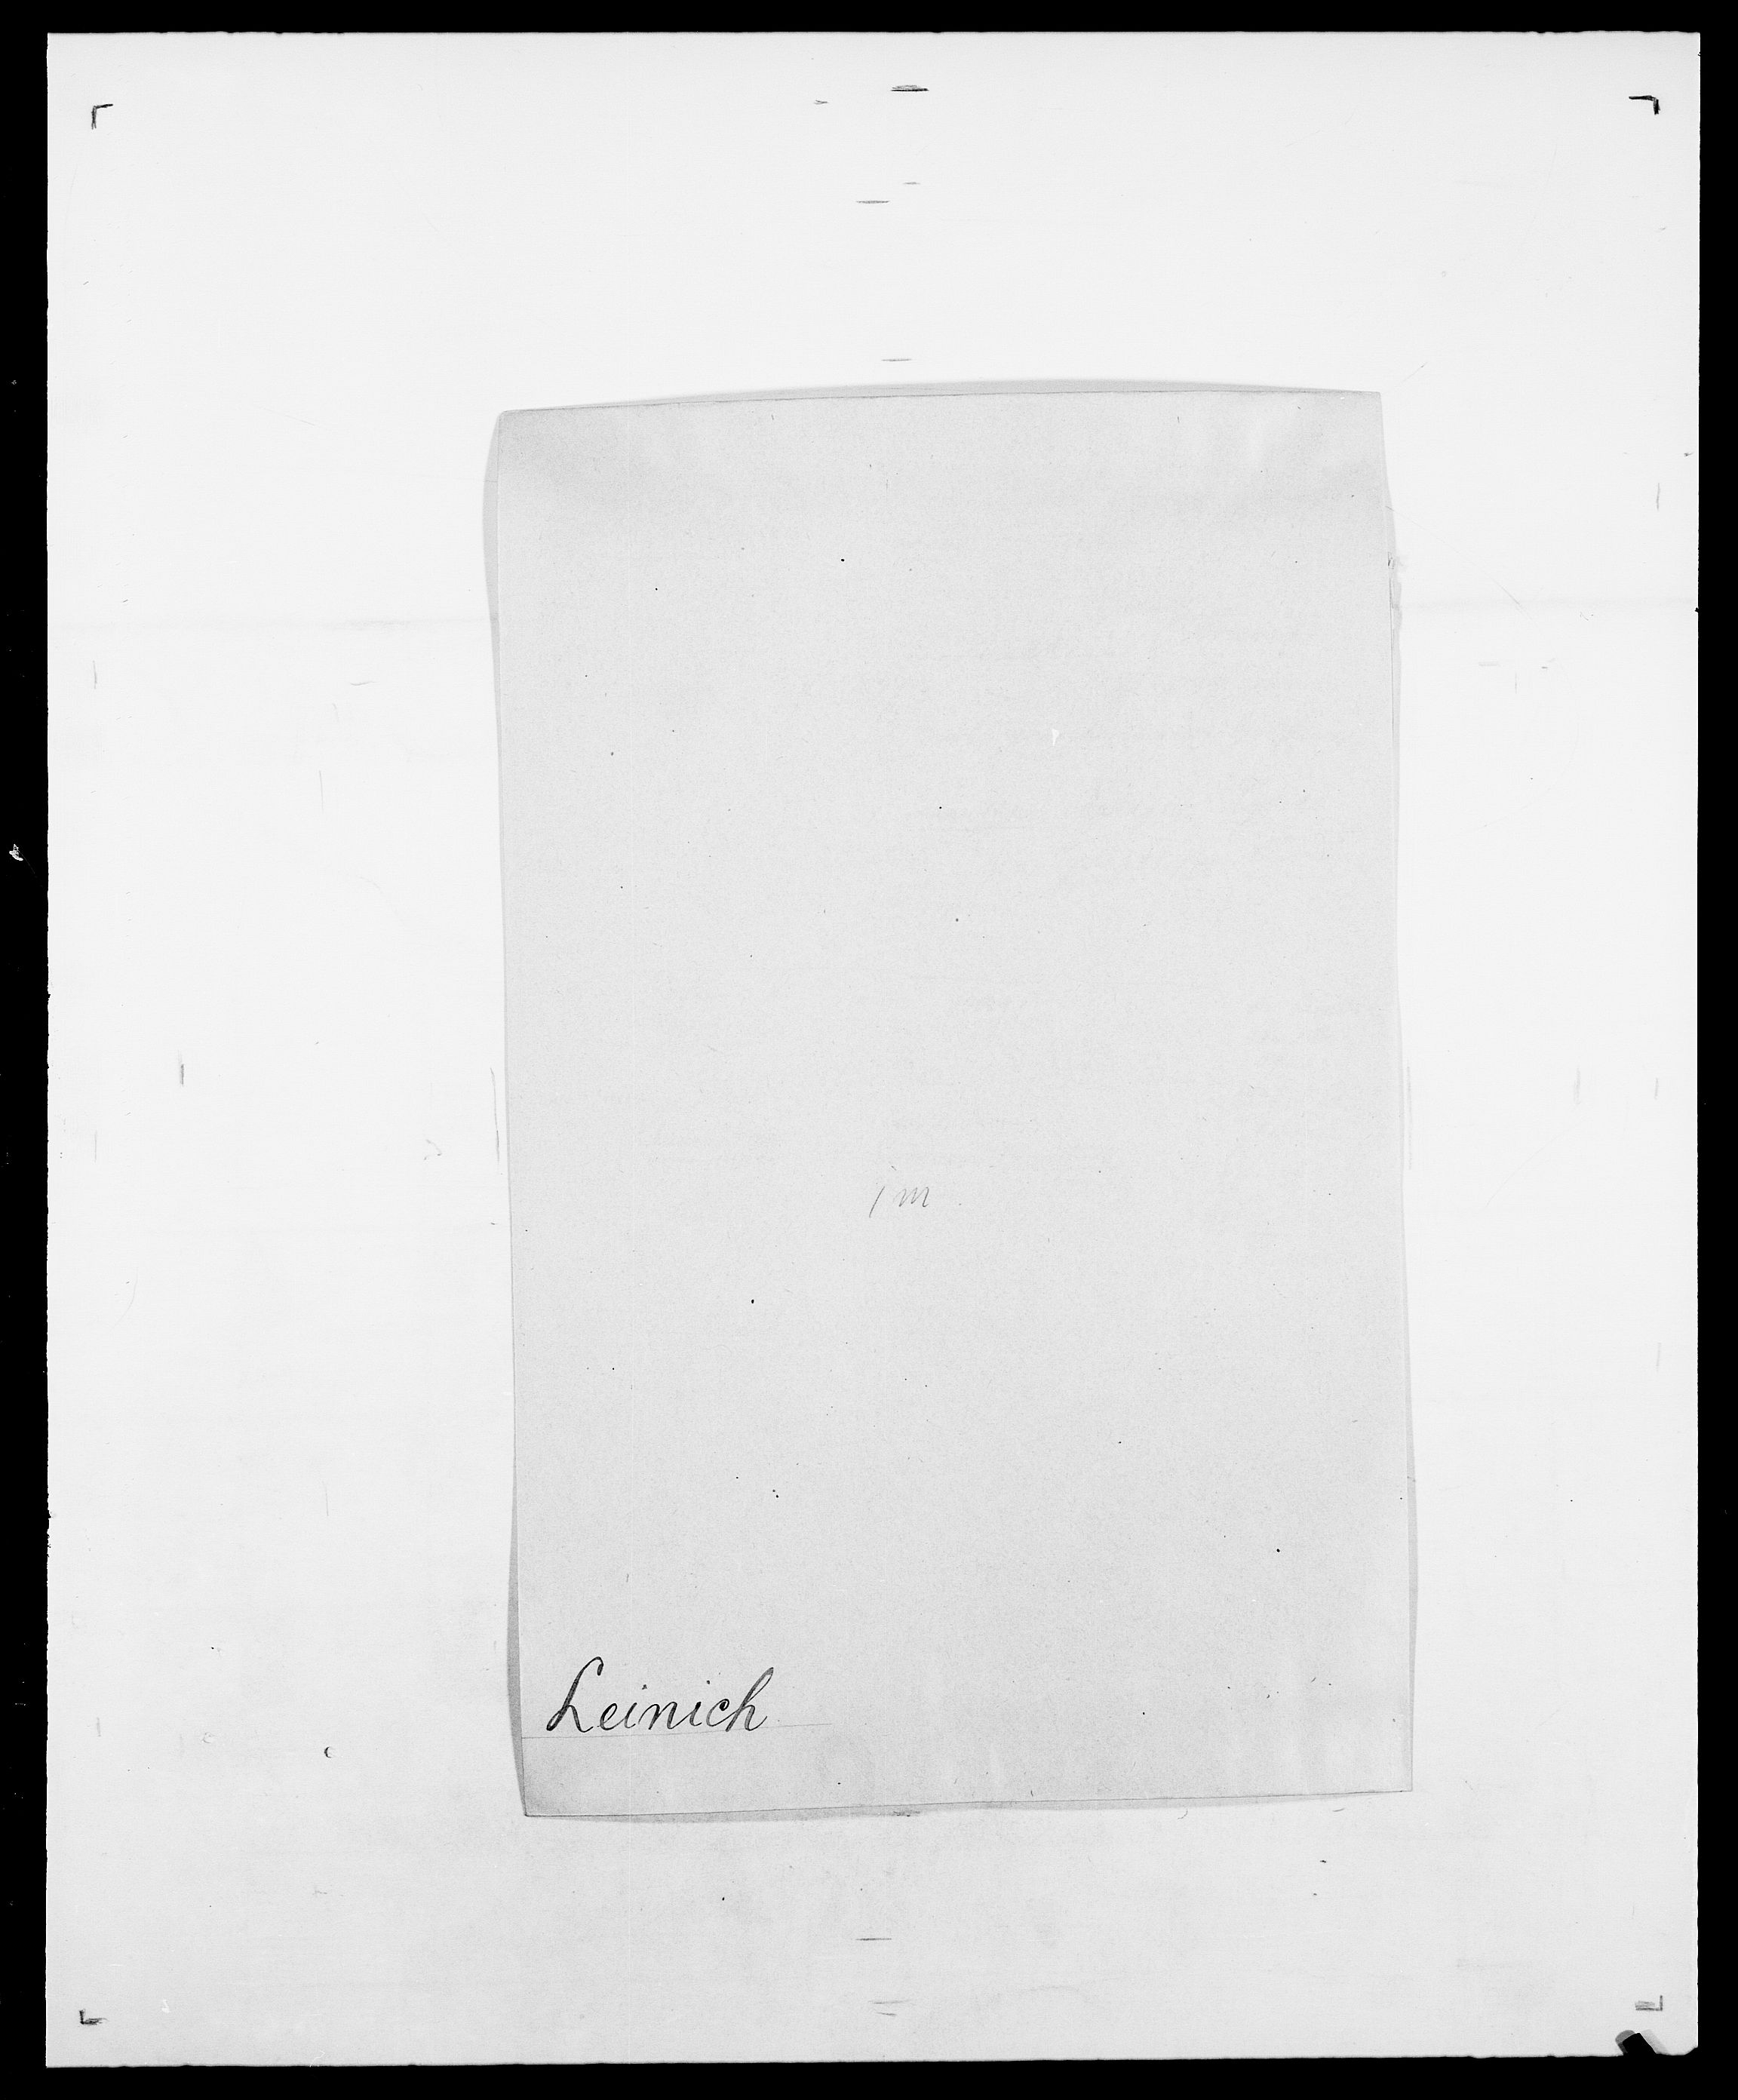 SAO, Delgobe, Charles Antoine - samling, D/Da/L0023: Lau - Lirvyn, s. 147